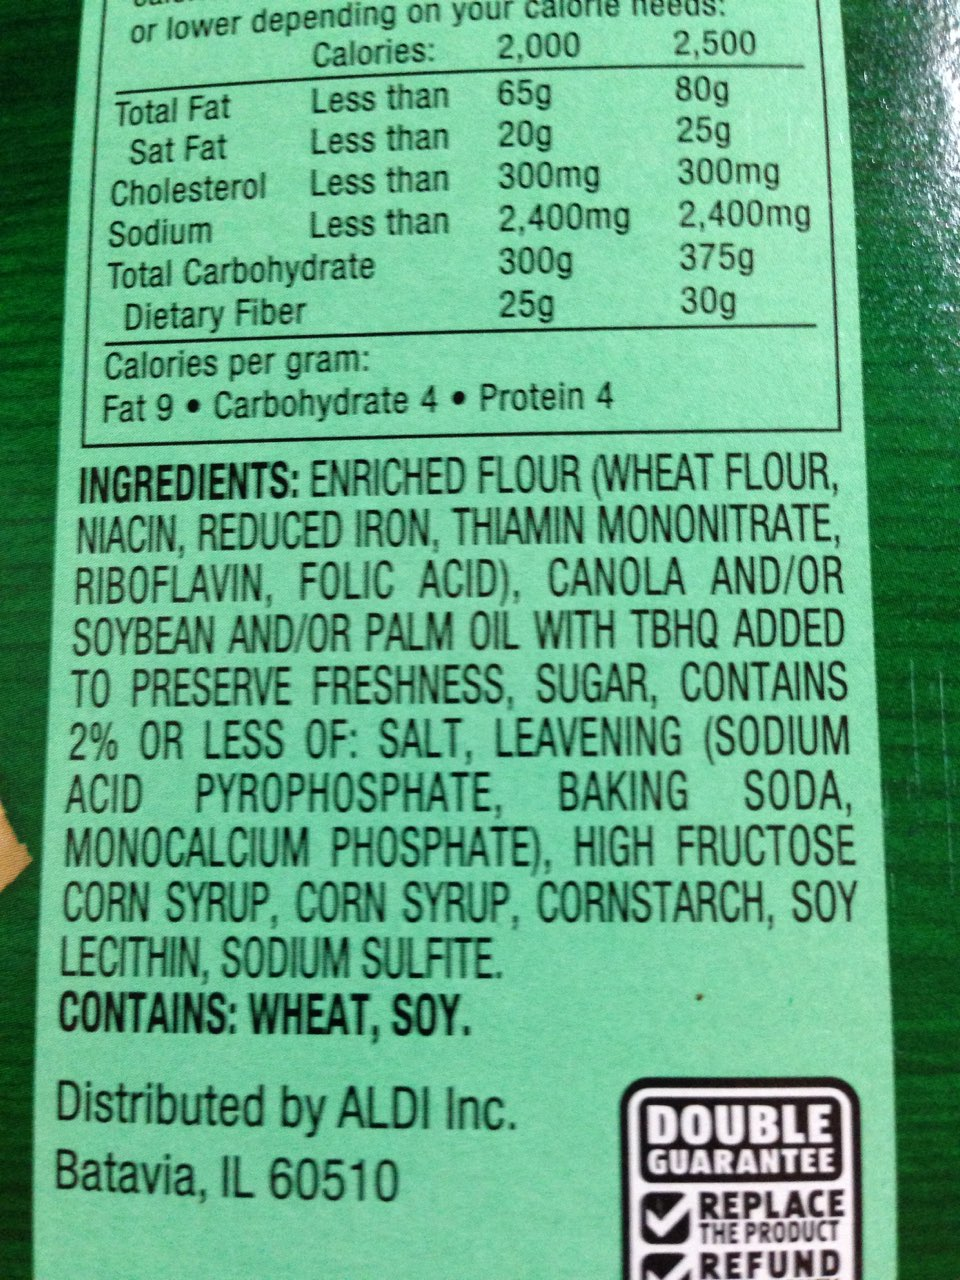 Savoritz Gourmet Crackers: Calories, Nutrition Analysis